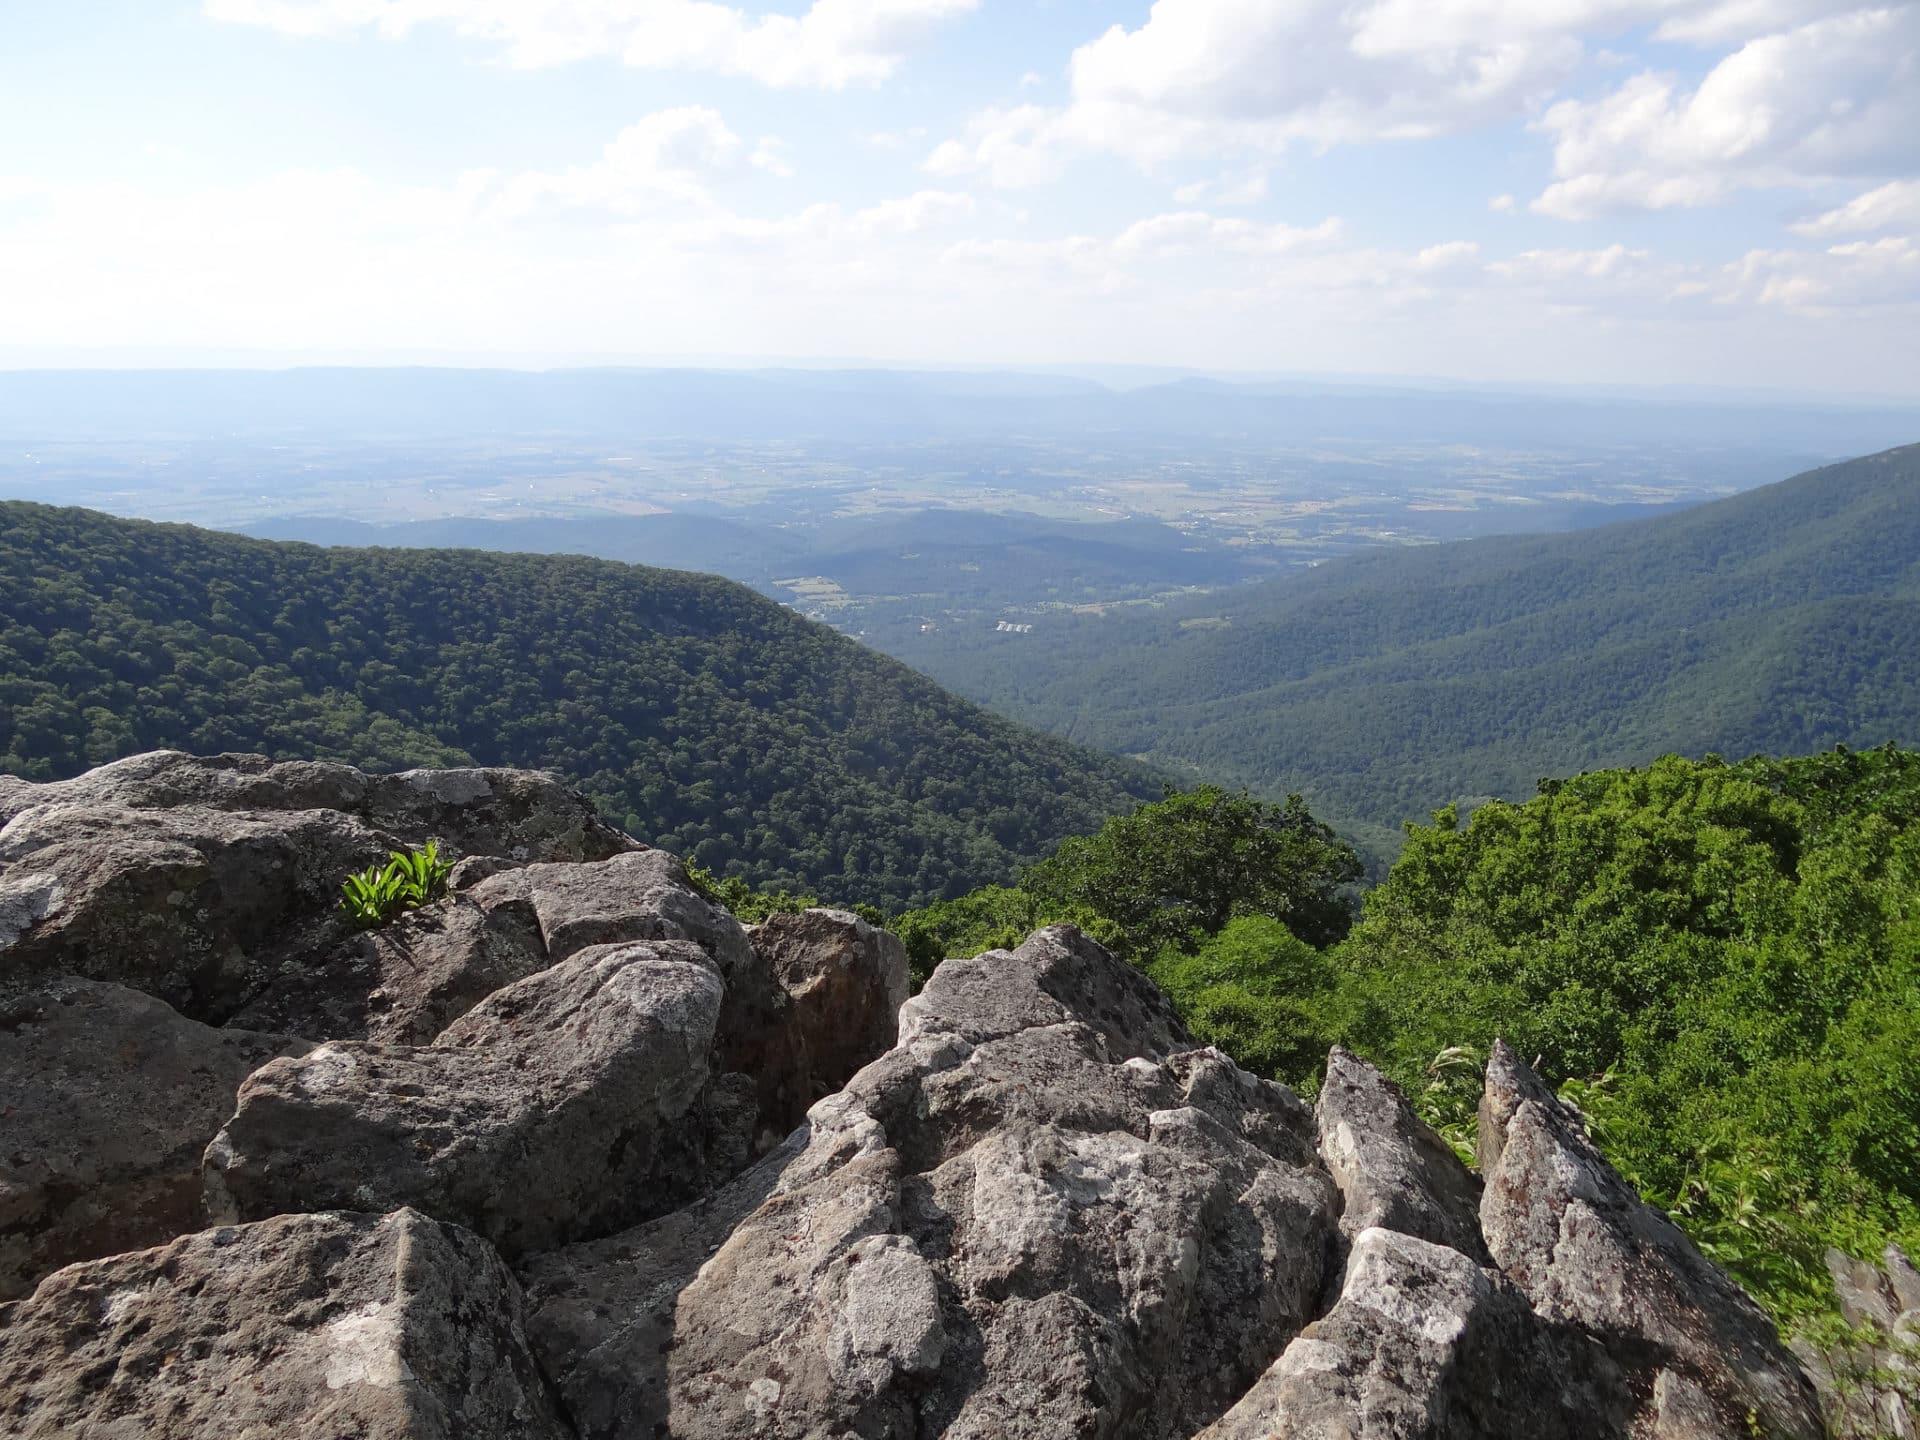 Rock Climbing day in Shenandoah National Park, WV